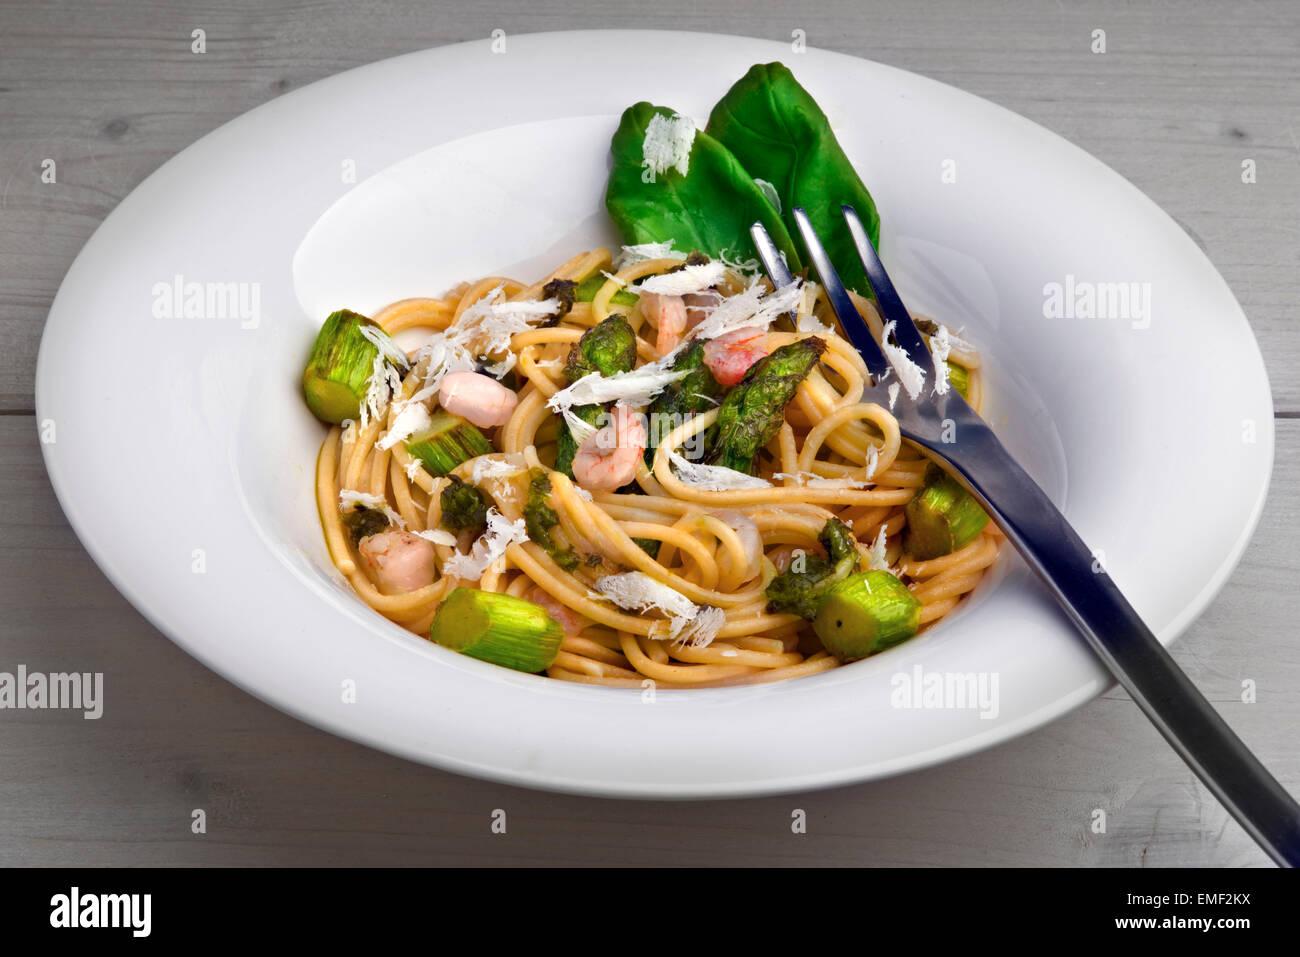 Whole grain pasta with green asparagus, shrimp, wild garlic (buckrams) pesto, parmesan shavings and basil leaves. - Stock Image